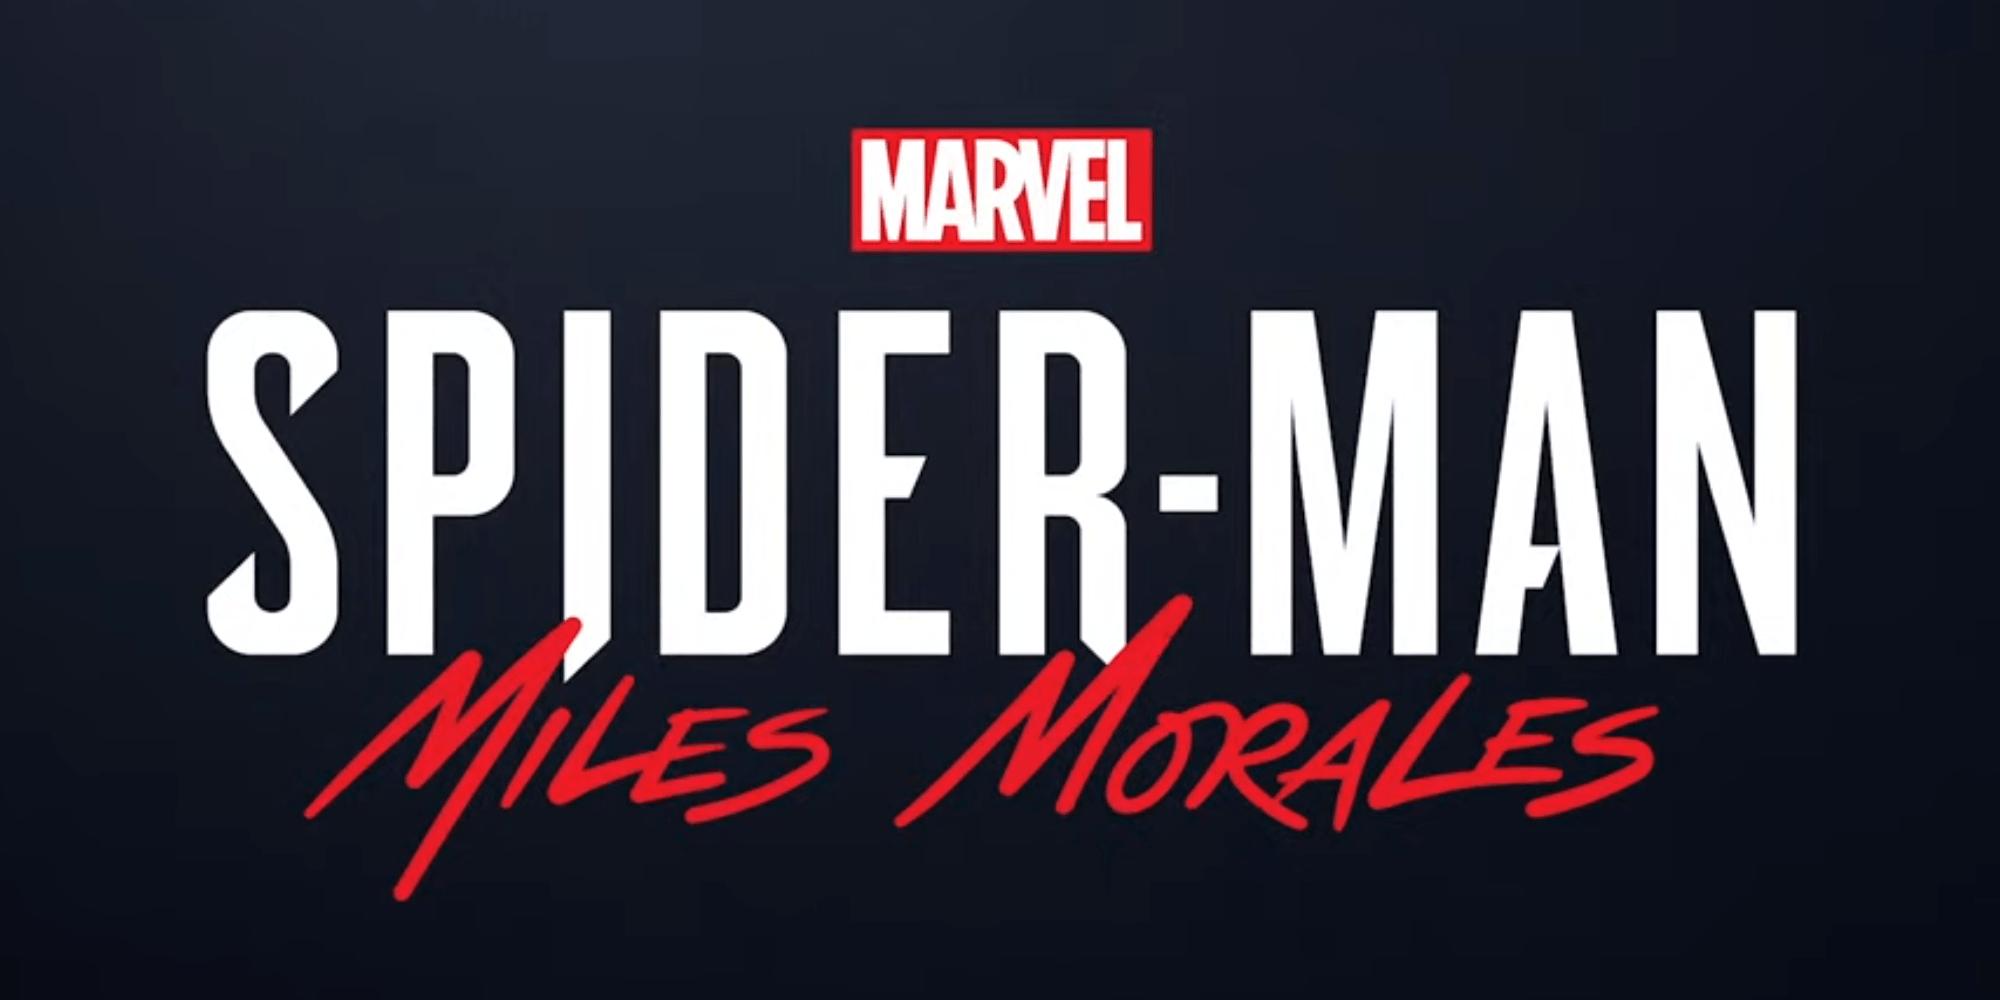 marvel-spider-man-miles-morales.png?fit=2000%2C1000&strip=all